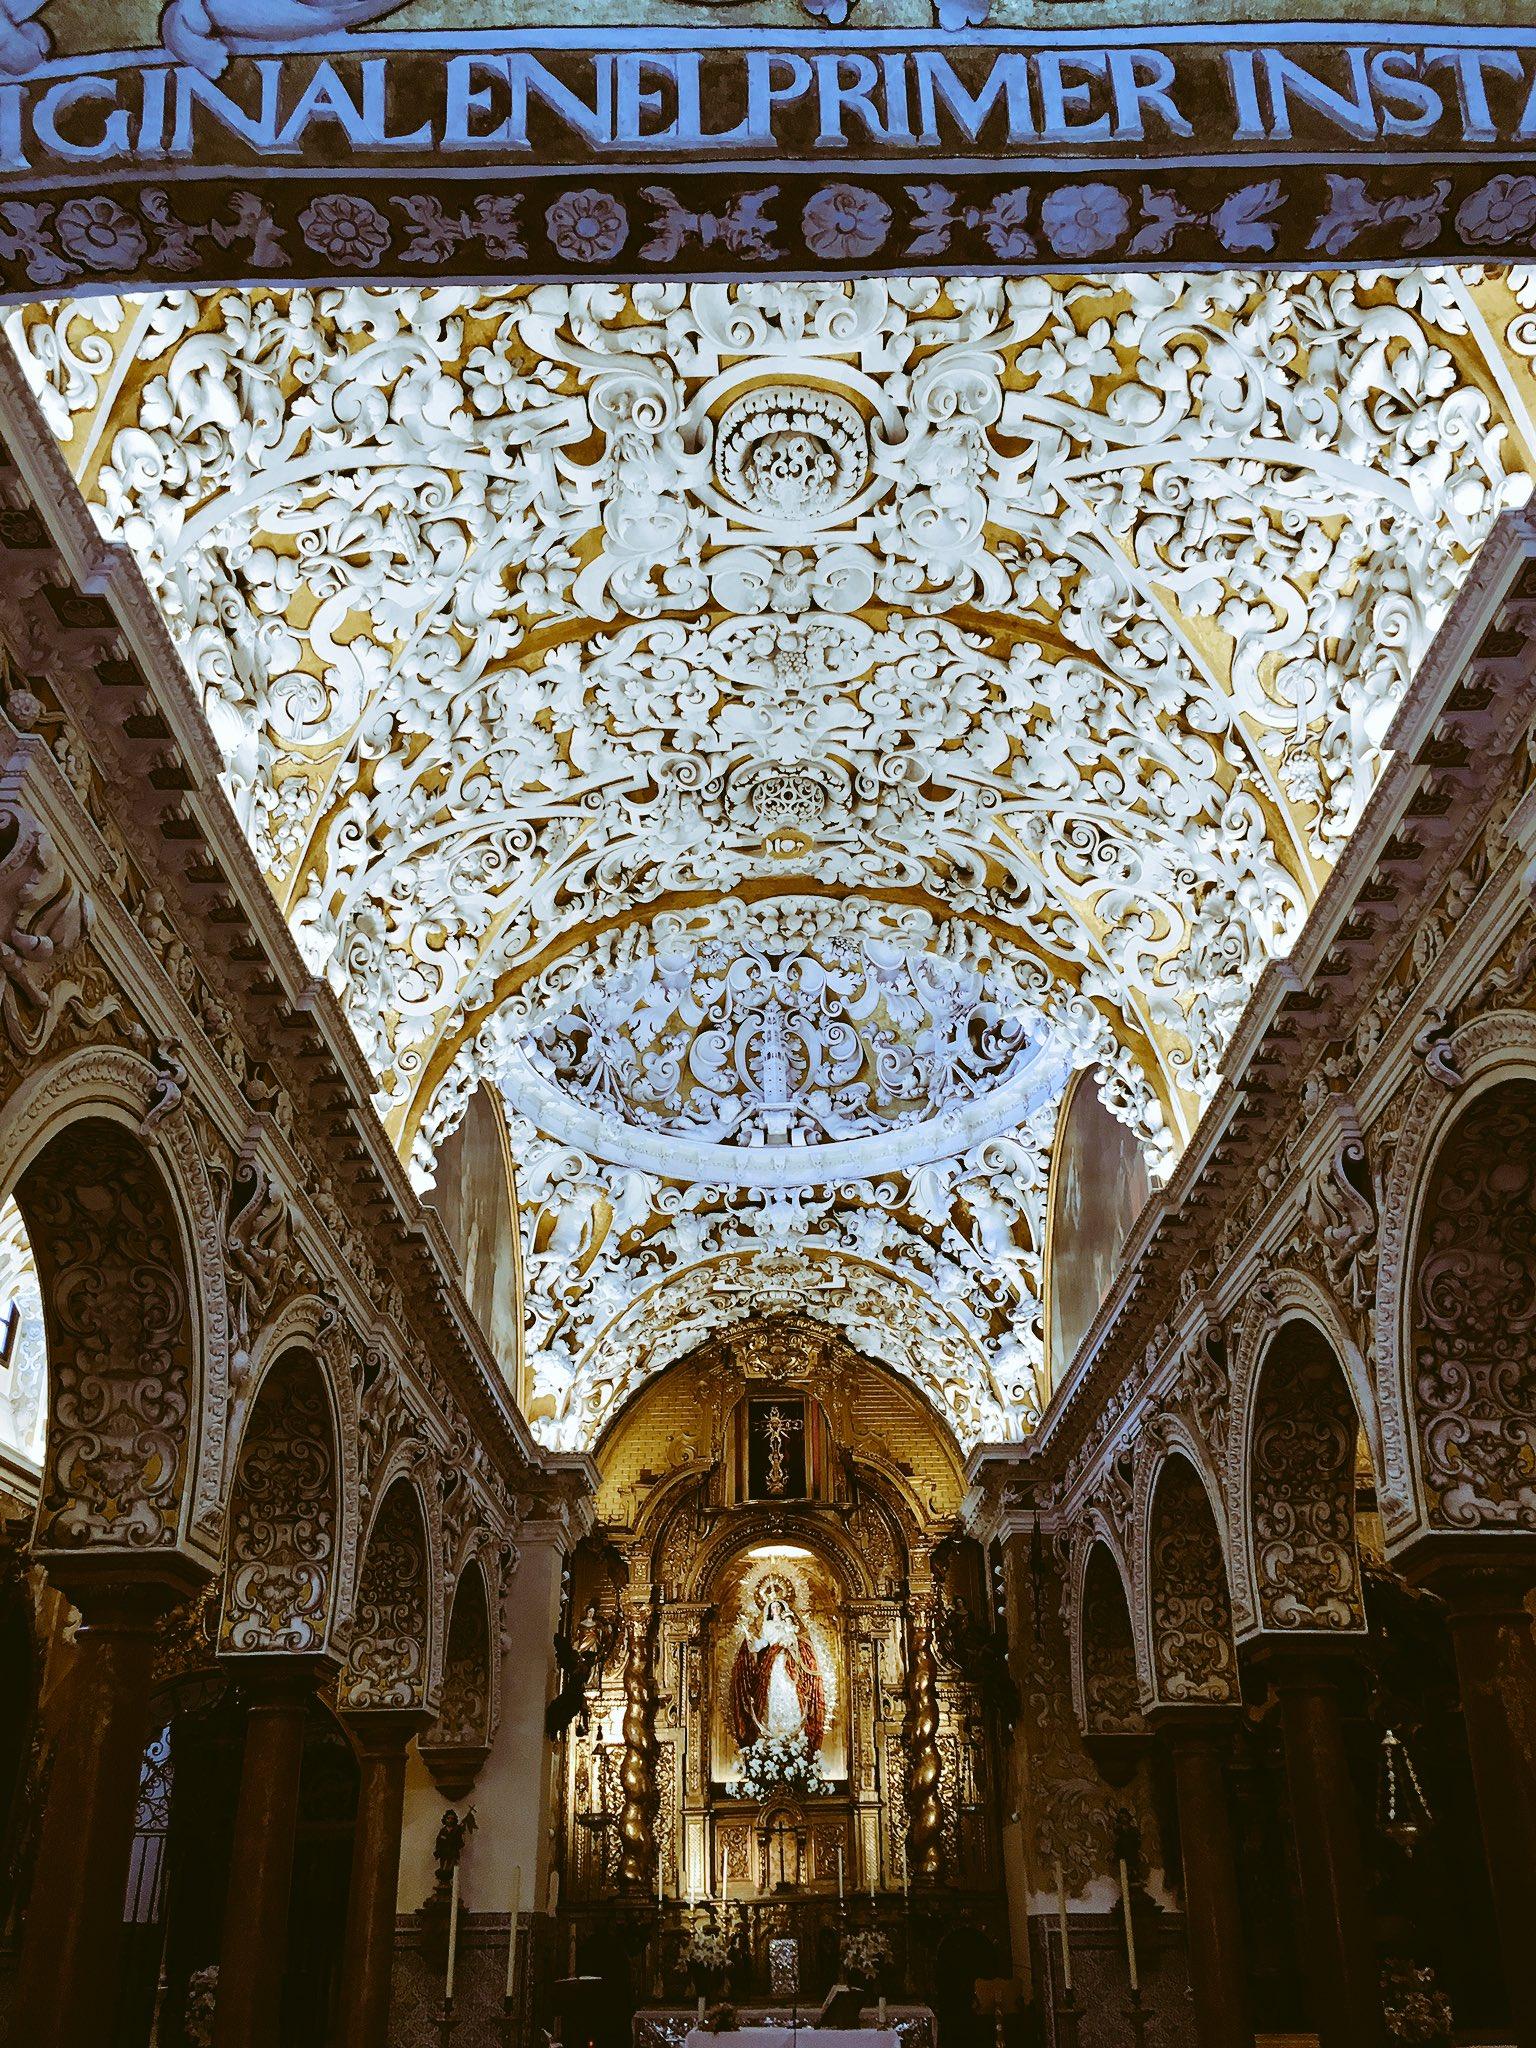 #iglesiasantamariablanca #Andalucia @sevillaciudad @viveandalucia https://t.co/XramB7MxCO